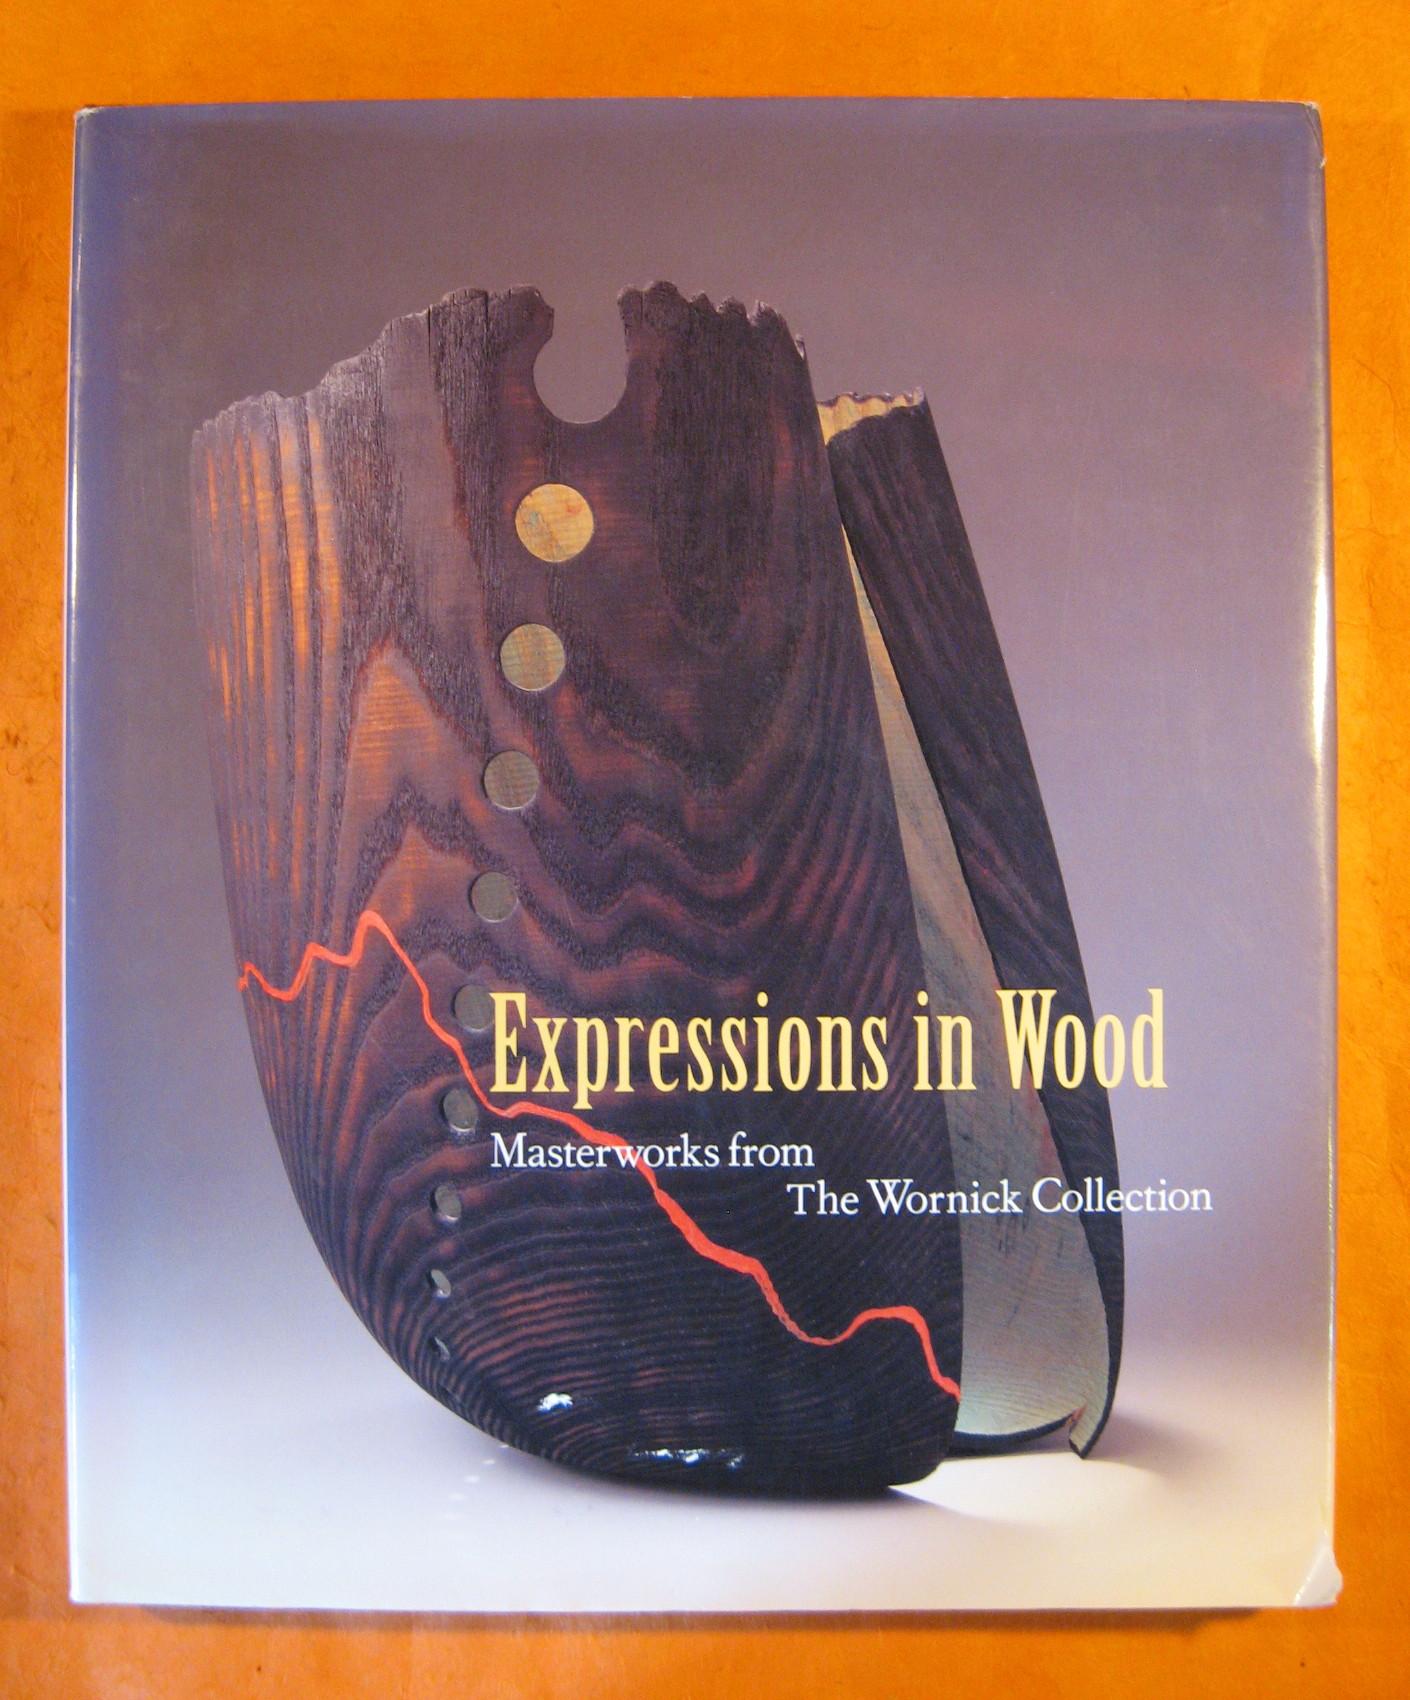 Expressions in Wood: Masterworks from the Wornick Collection, Kangas, Matthew;Perreault, John;Turner, Tran;Cooke, Edward S. Jr.;Oakland Museum of California;McAllen International Museum (McAllen, Tex.)